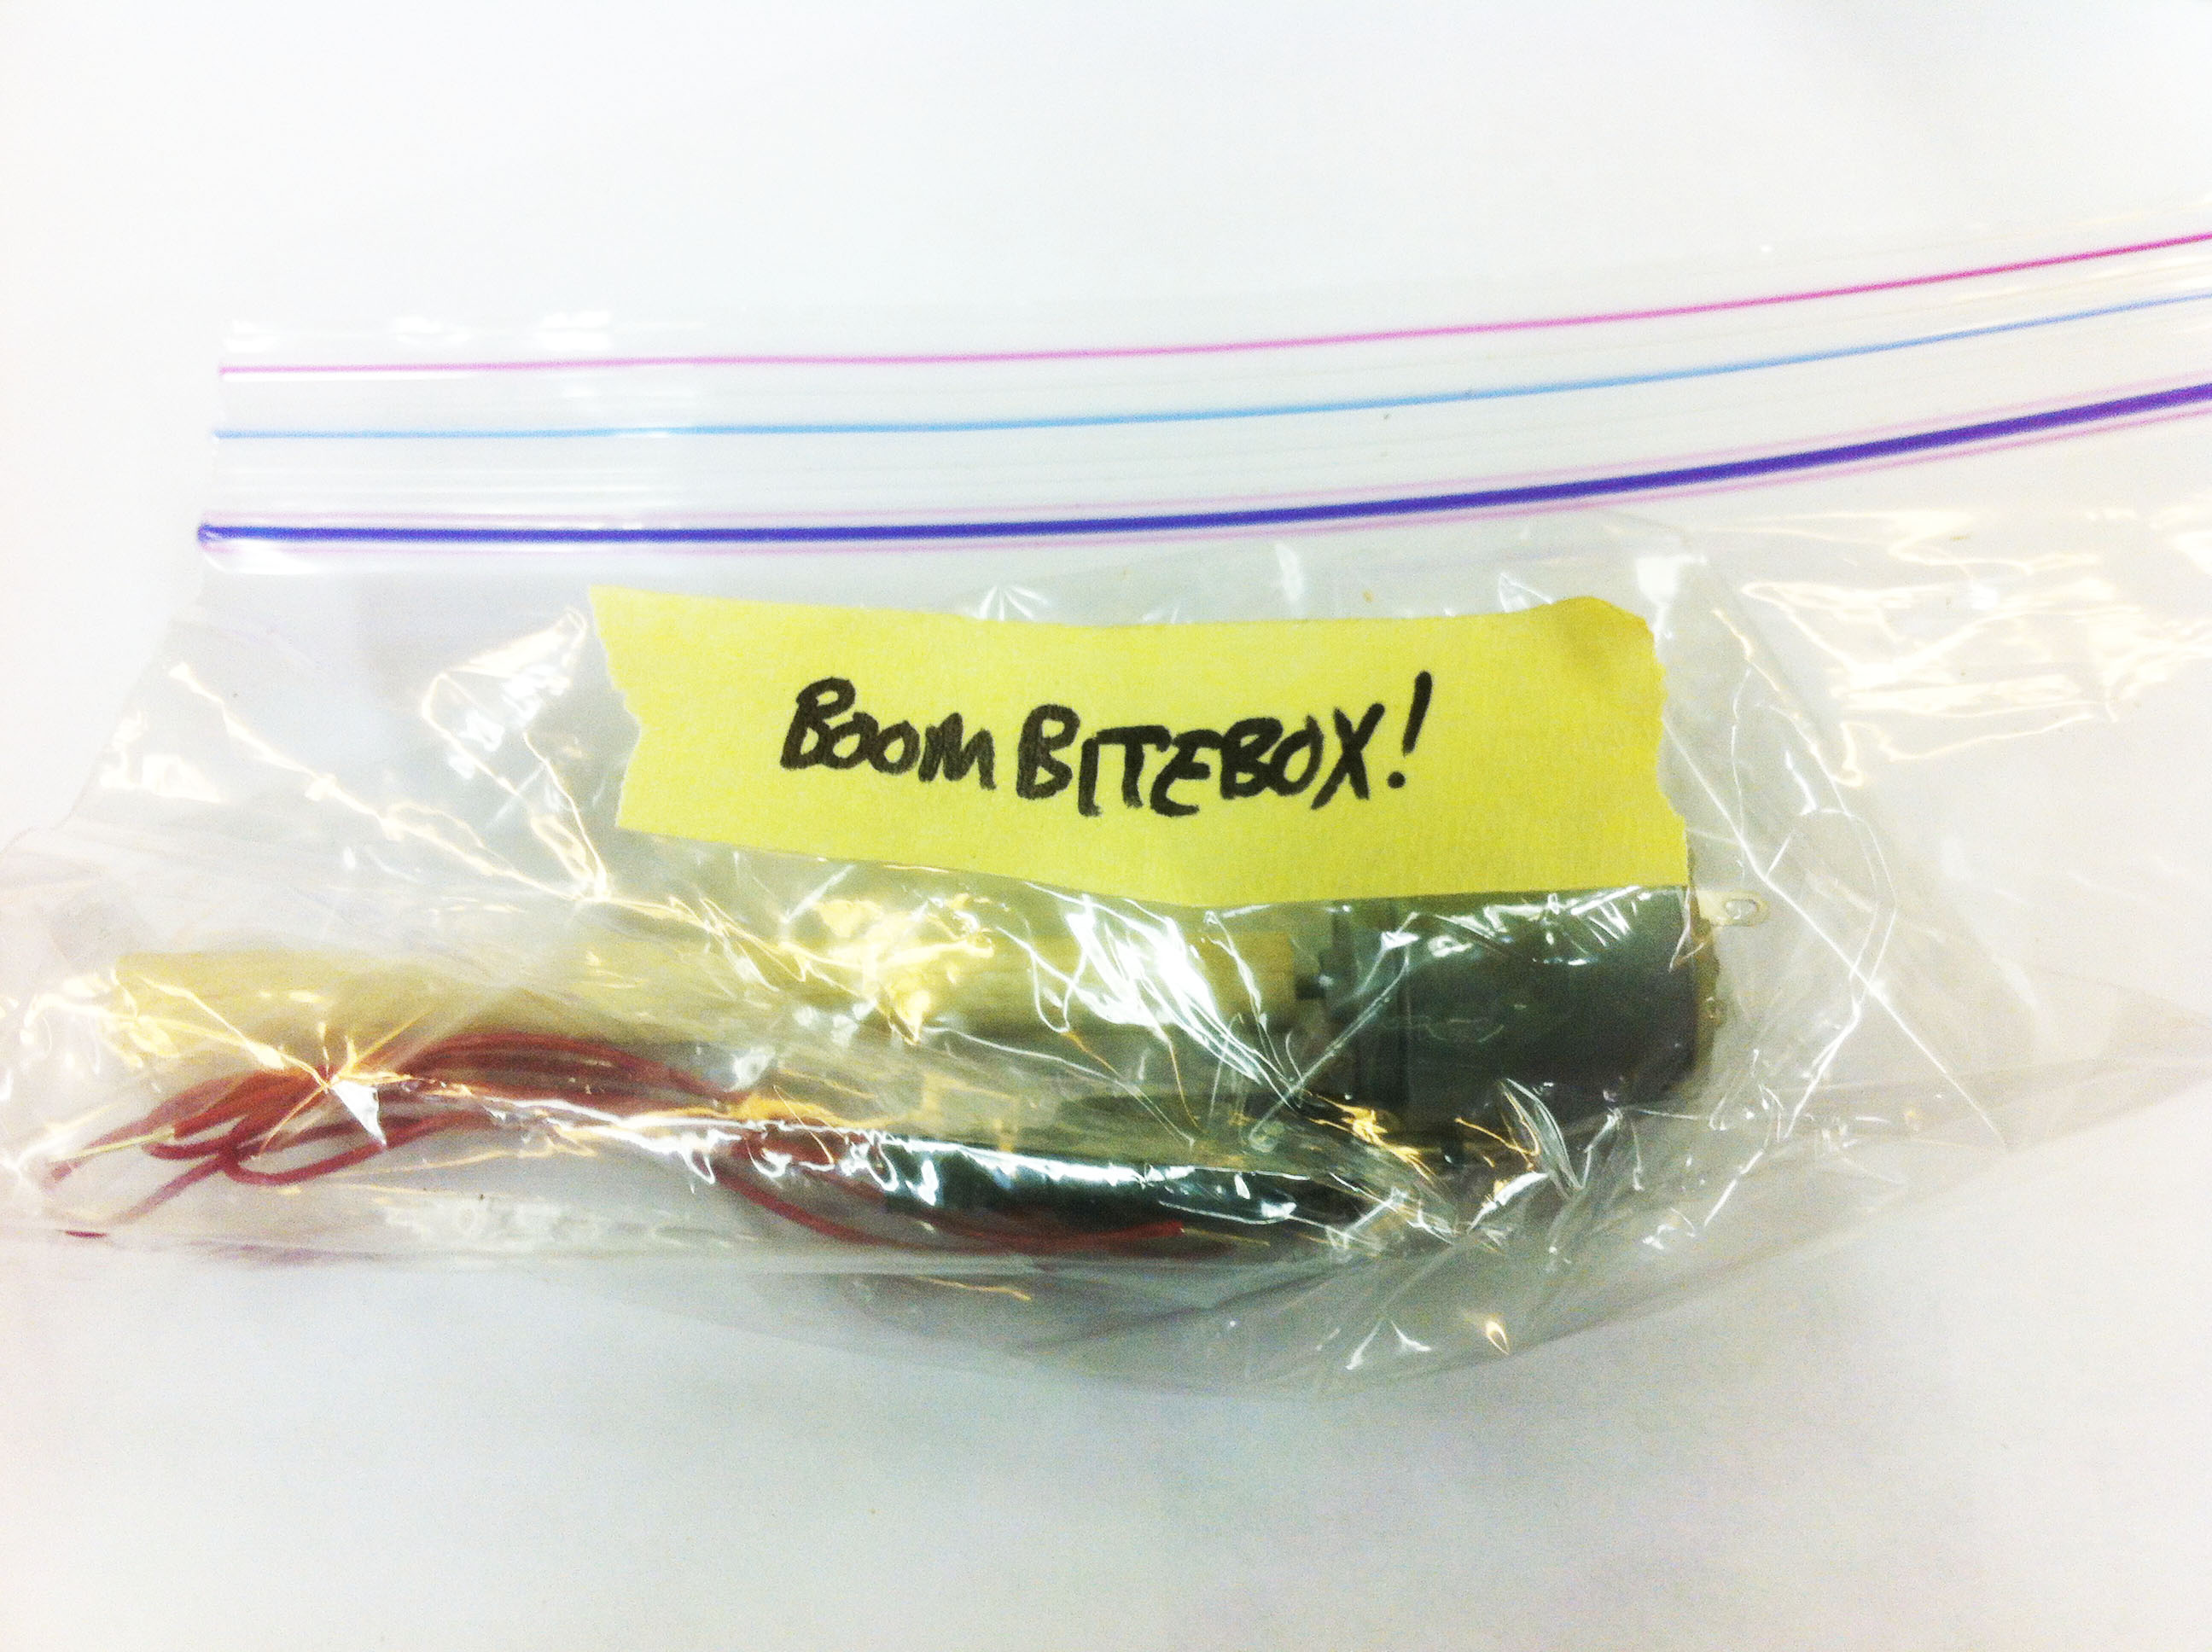 Boom Bite Box